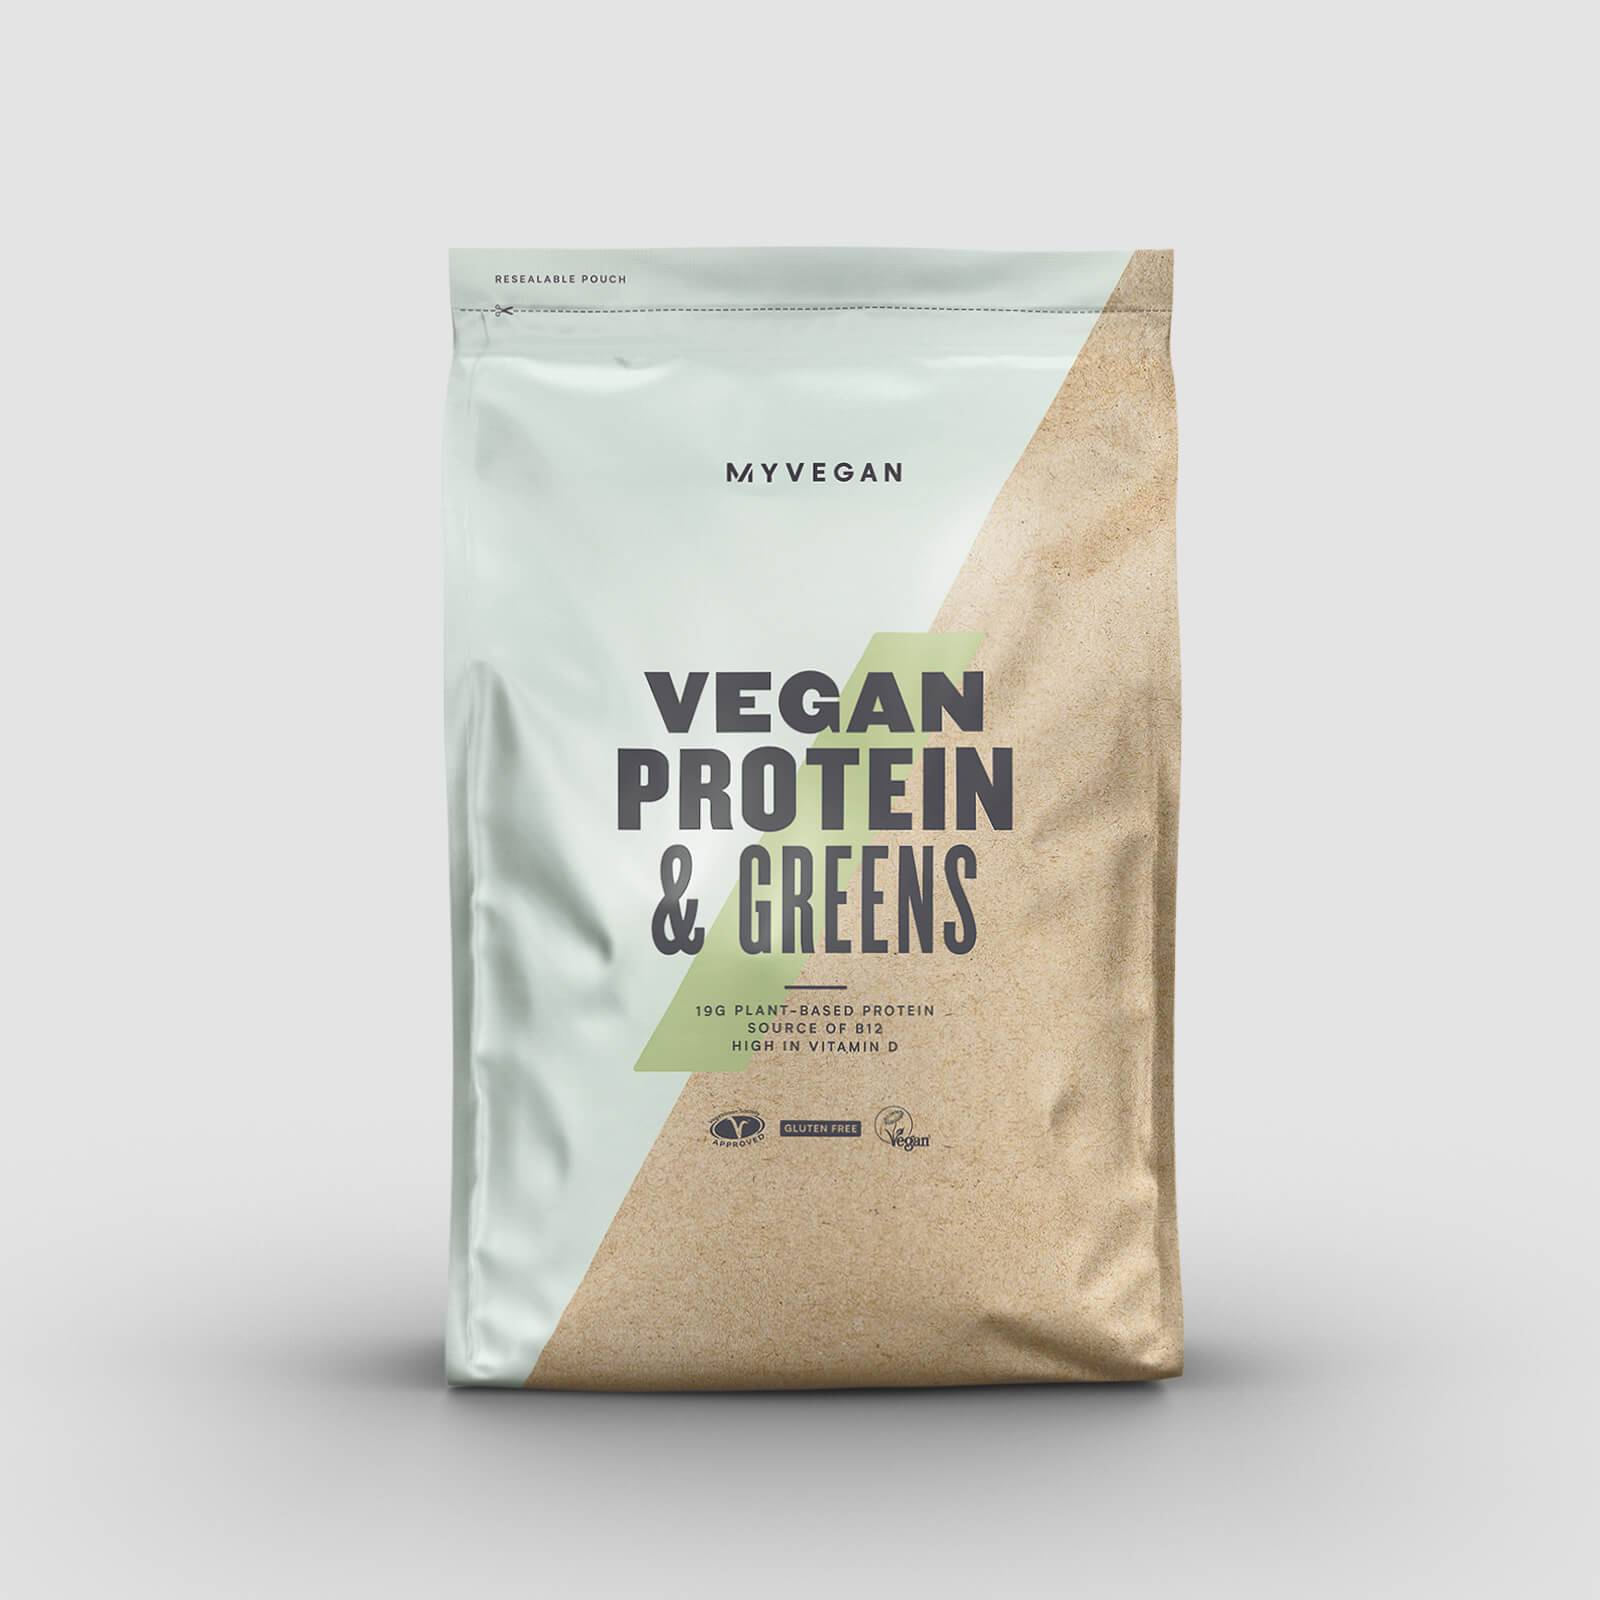 Myprotein Protéines végétaliennes et légumes verts - 1kg - Café Moka